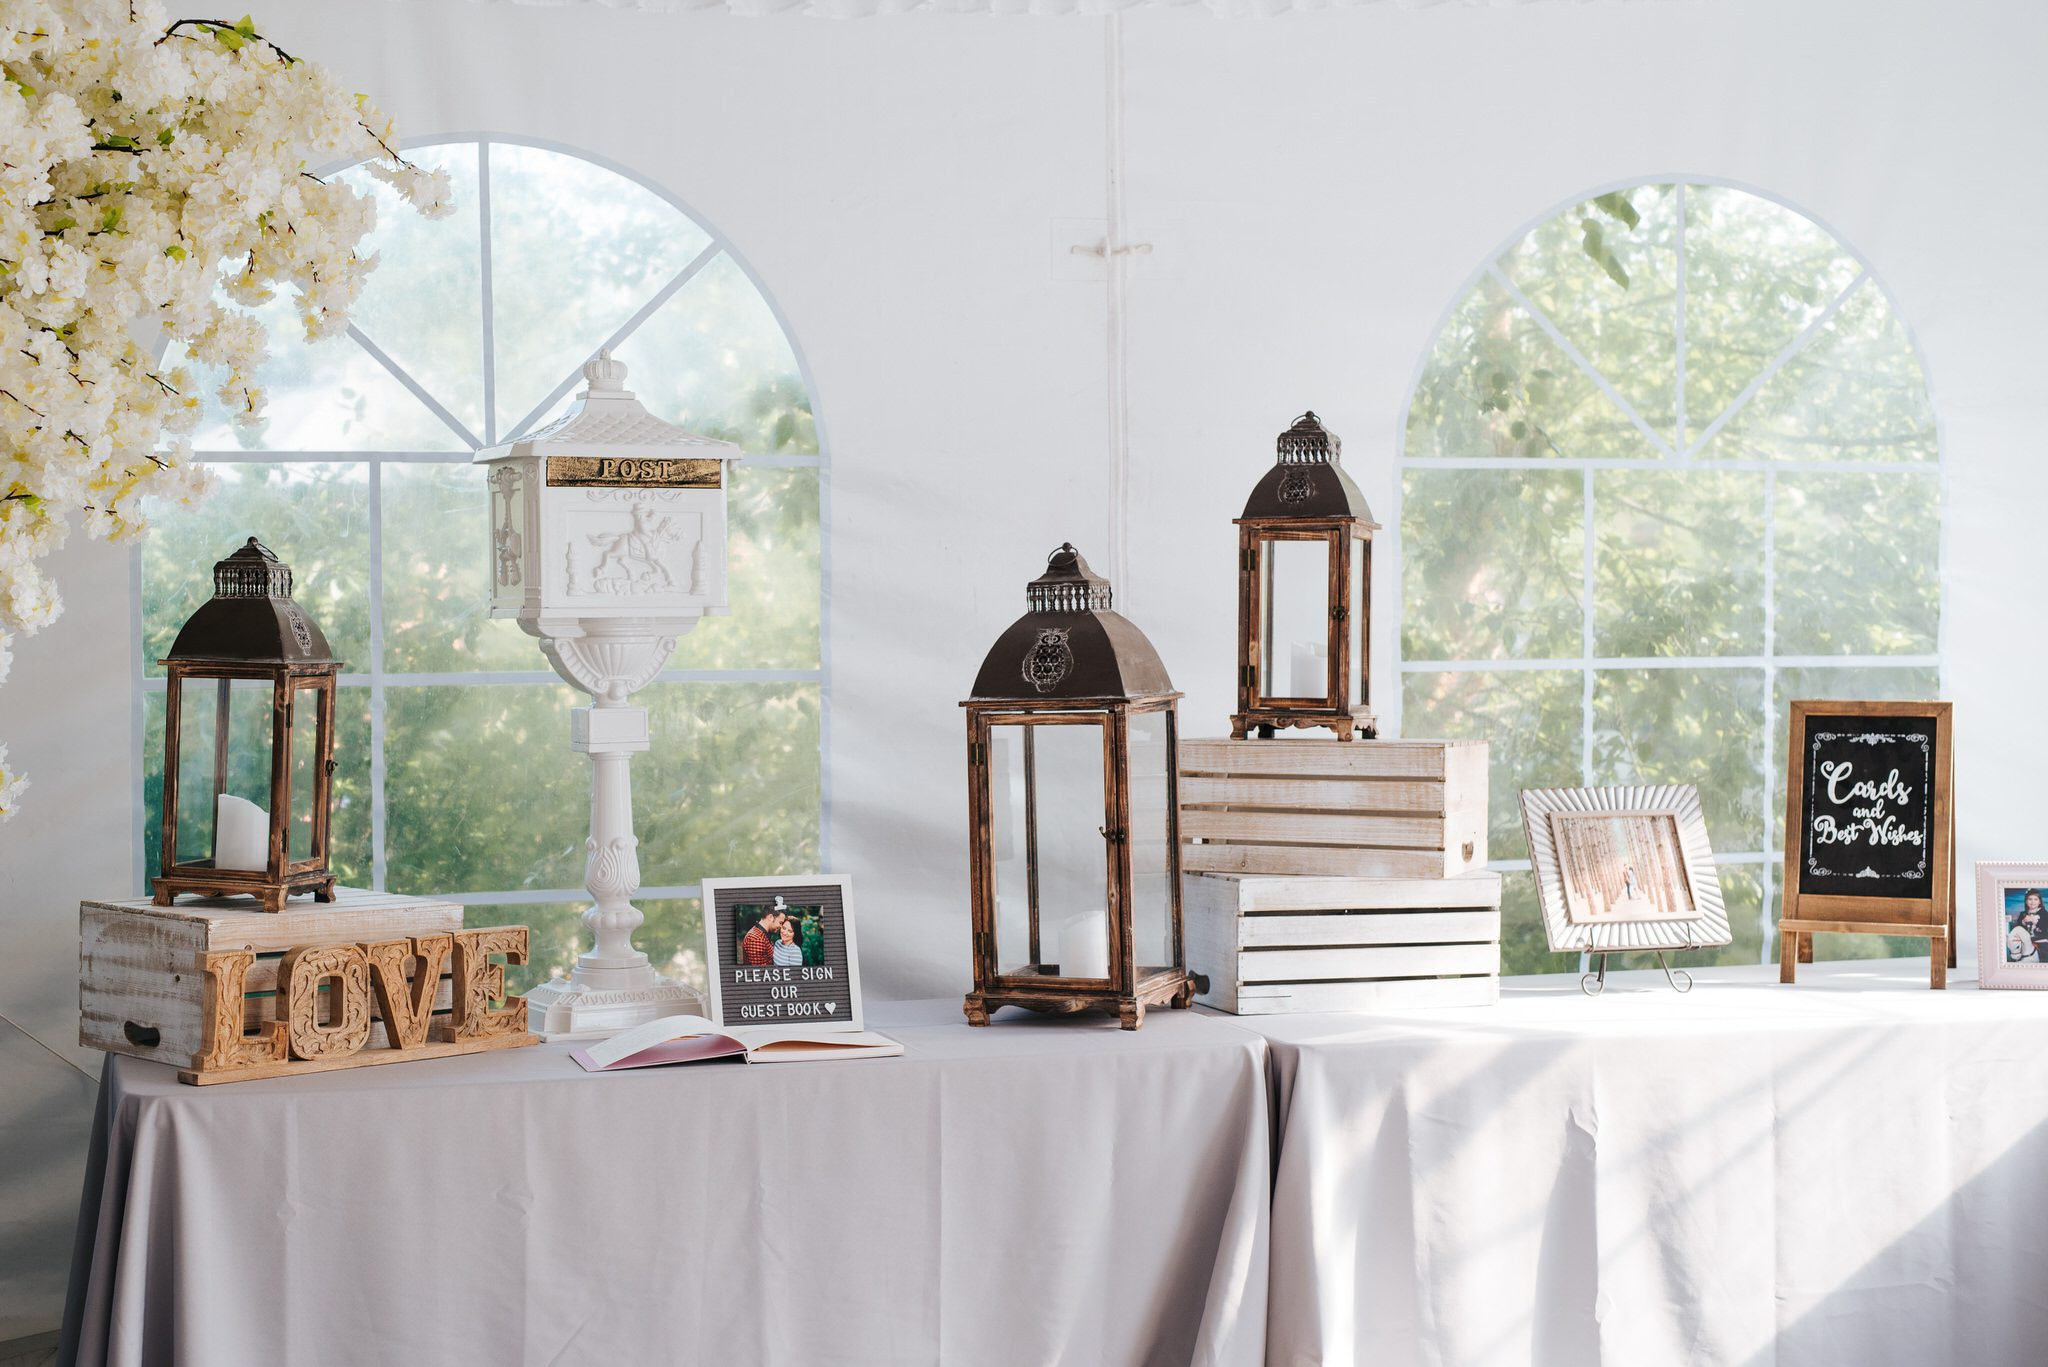 Bloomfield Gardens Wedding - table decor